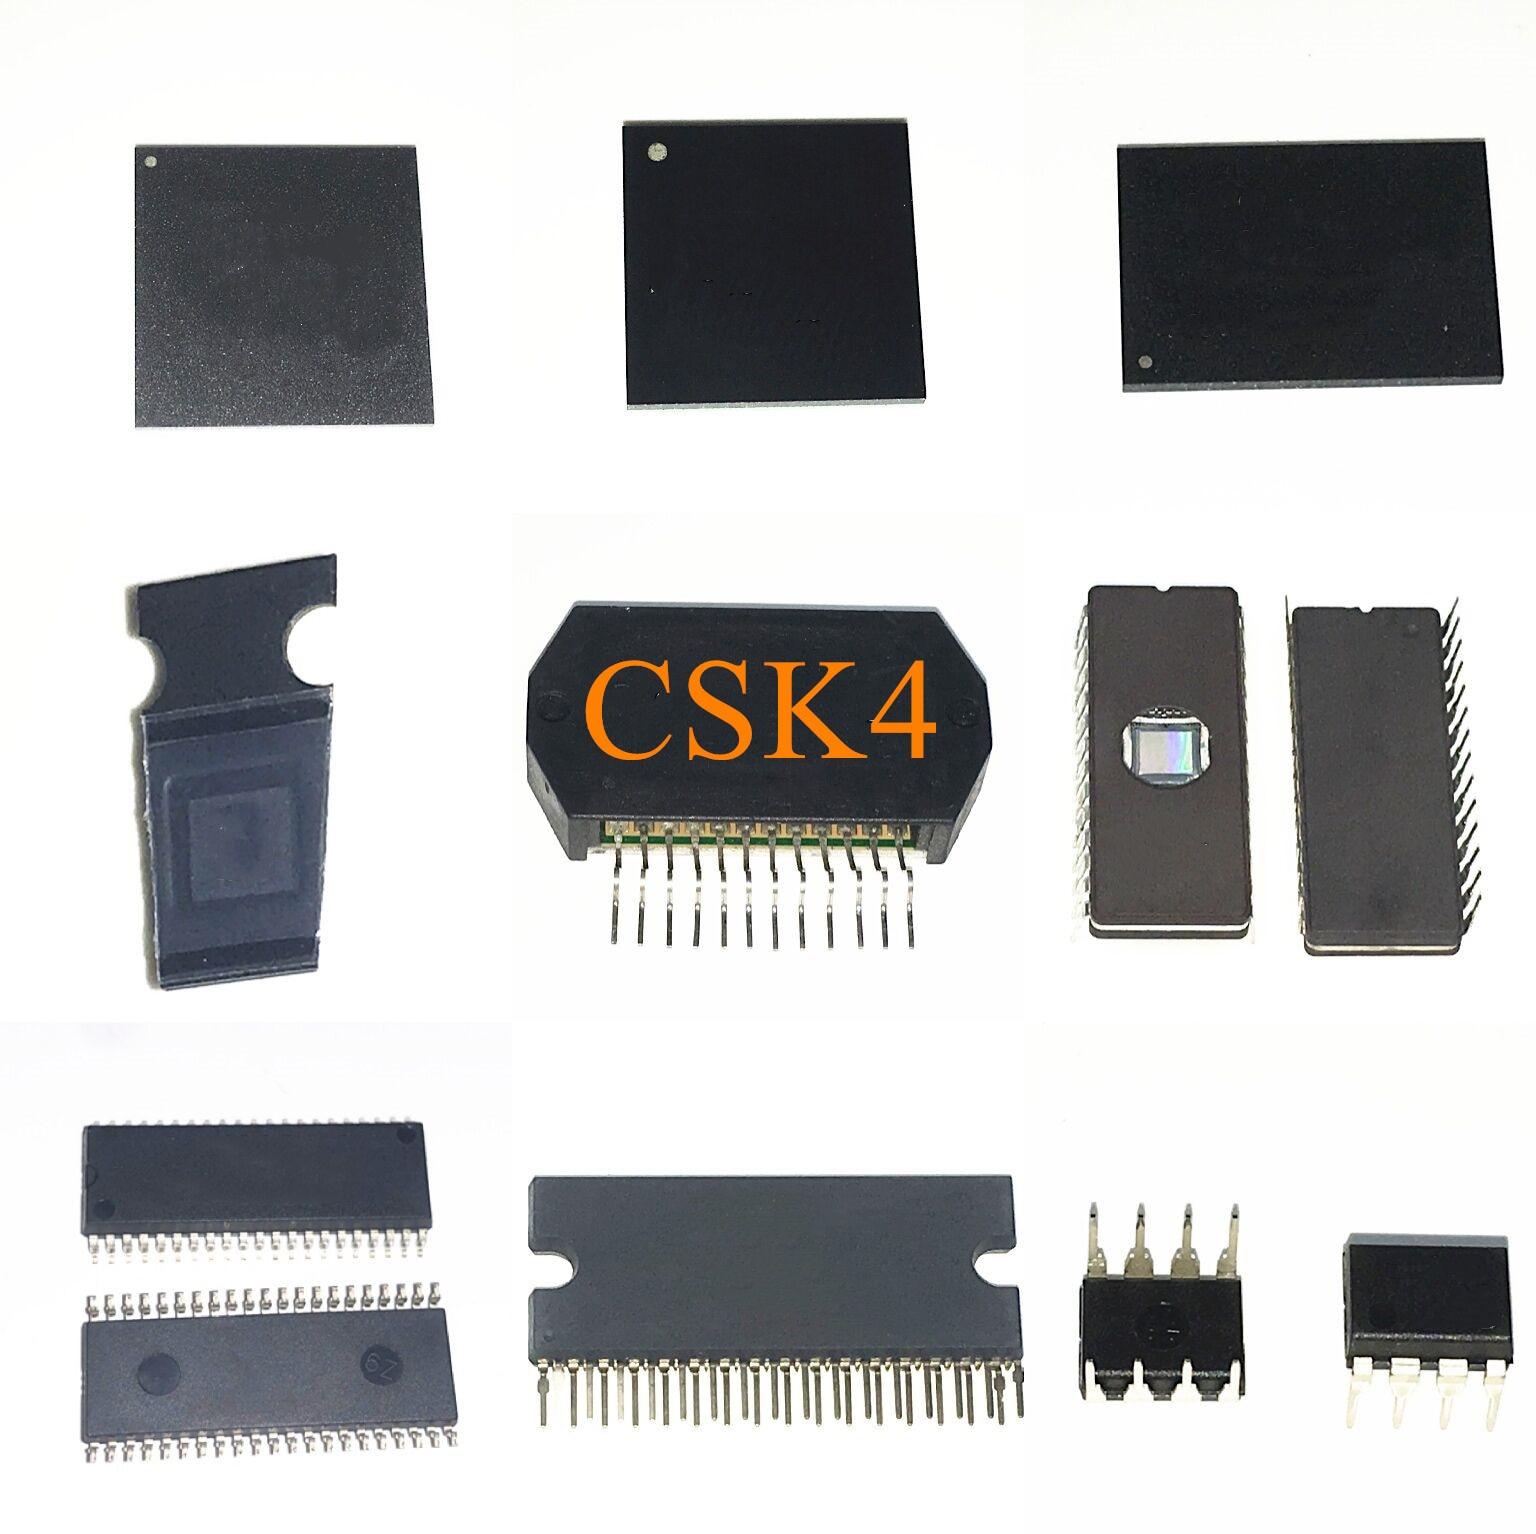 In Stock 2020 Direct Selling Promotion  New&original  SN74LS132N DIP-16 42 Input and Non-Door Schmidt Trigger IC